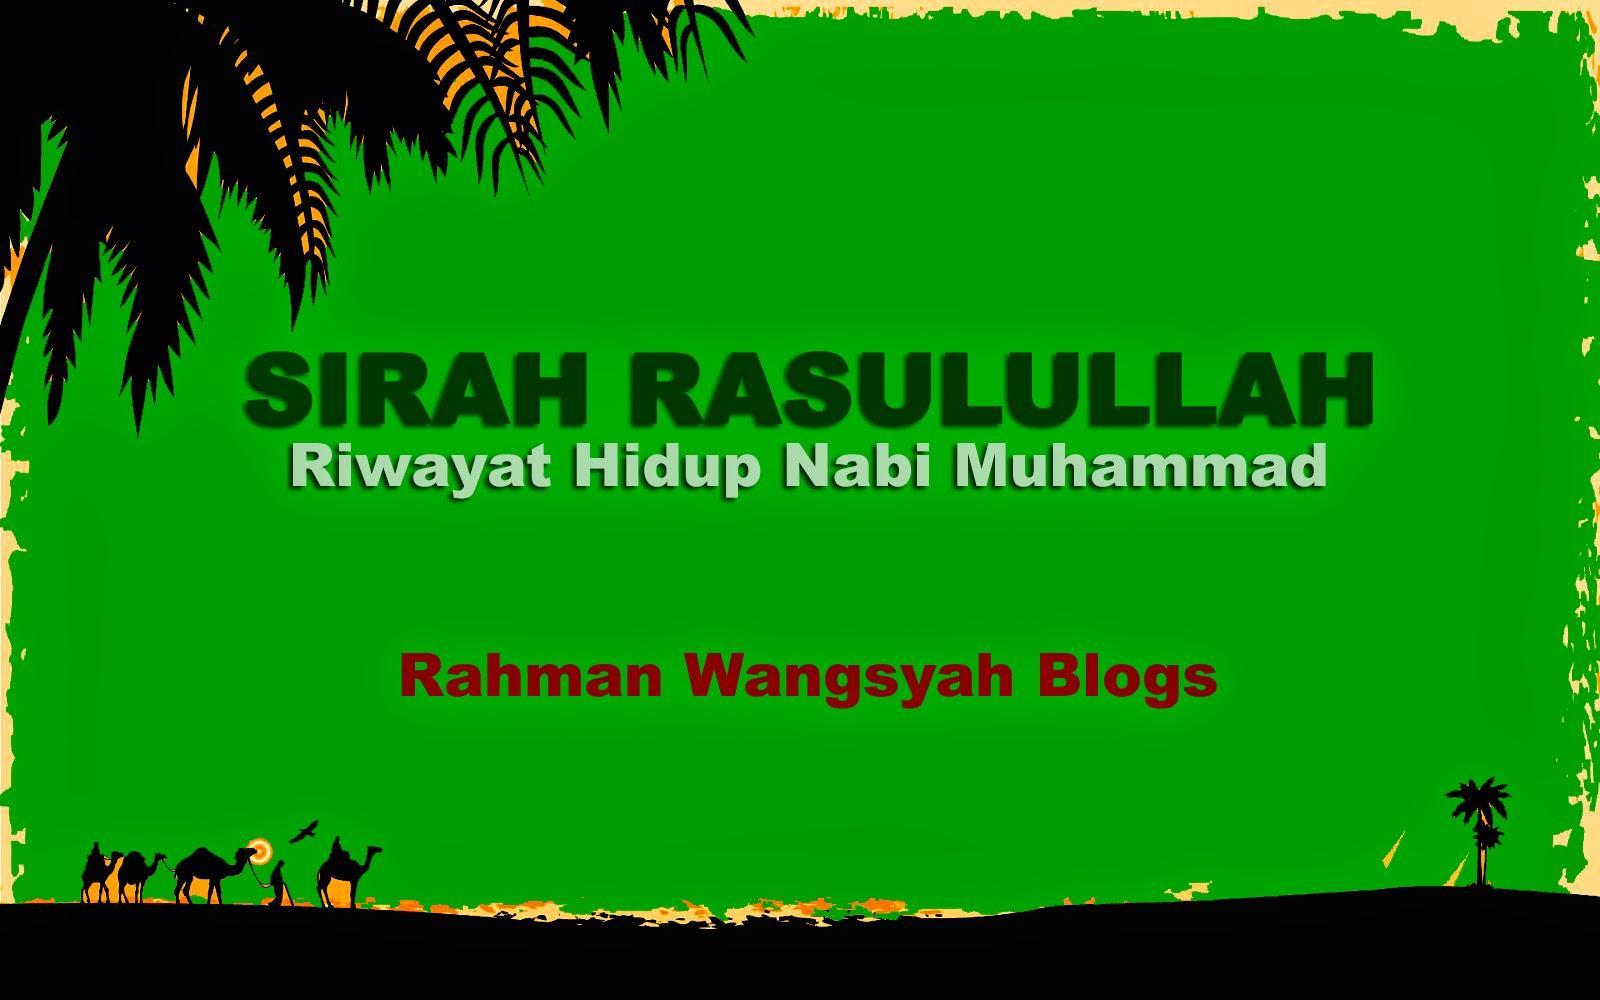 Kisah Rasulullah : Perjanjian Hudaibiya